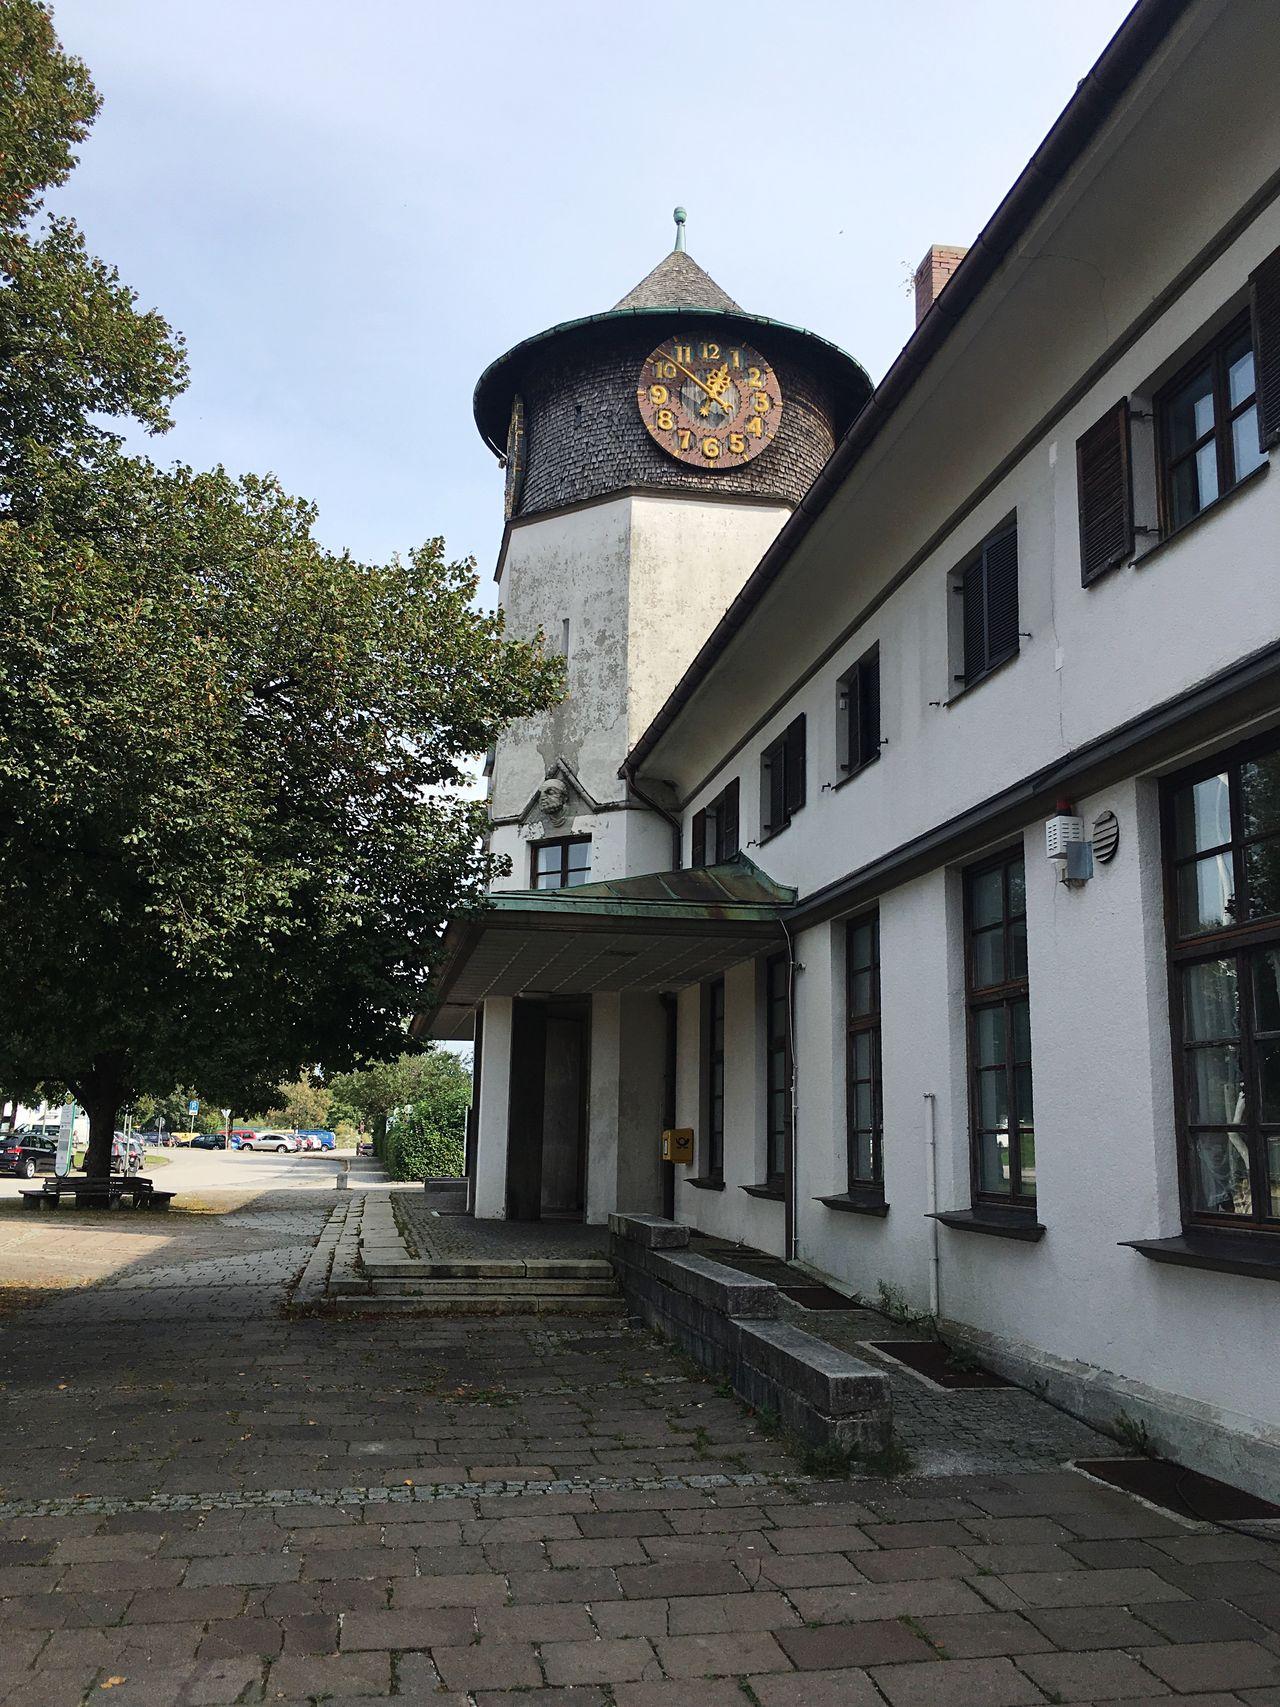 Bad Tölz Bahnhof Clock